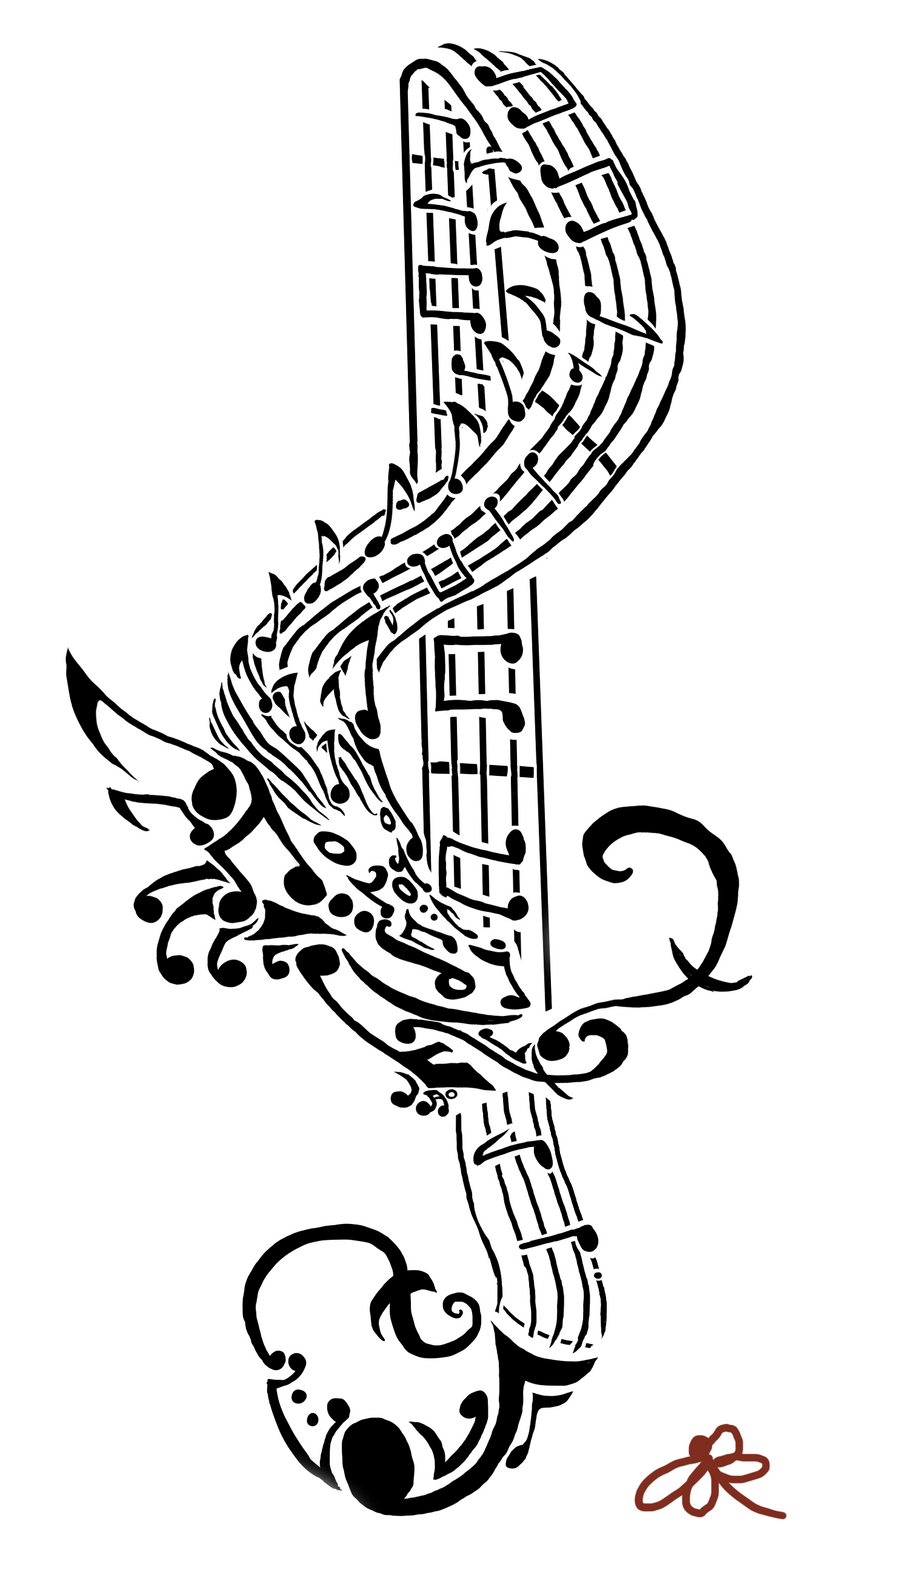 https://img00.deviantart.net/ce08/i/2011/353/5/4/bohemian_dragon_tribal_by_wolfay555-d4jmj1h.png Tribal Music Tattoo Designs